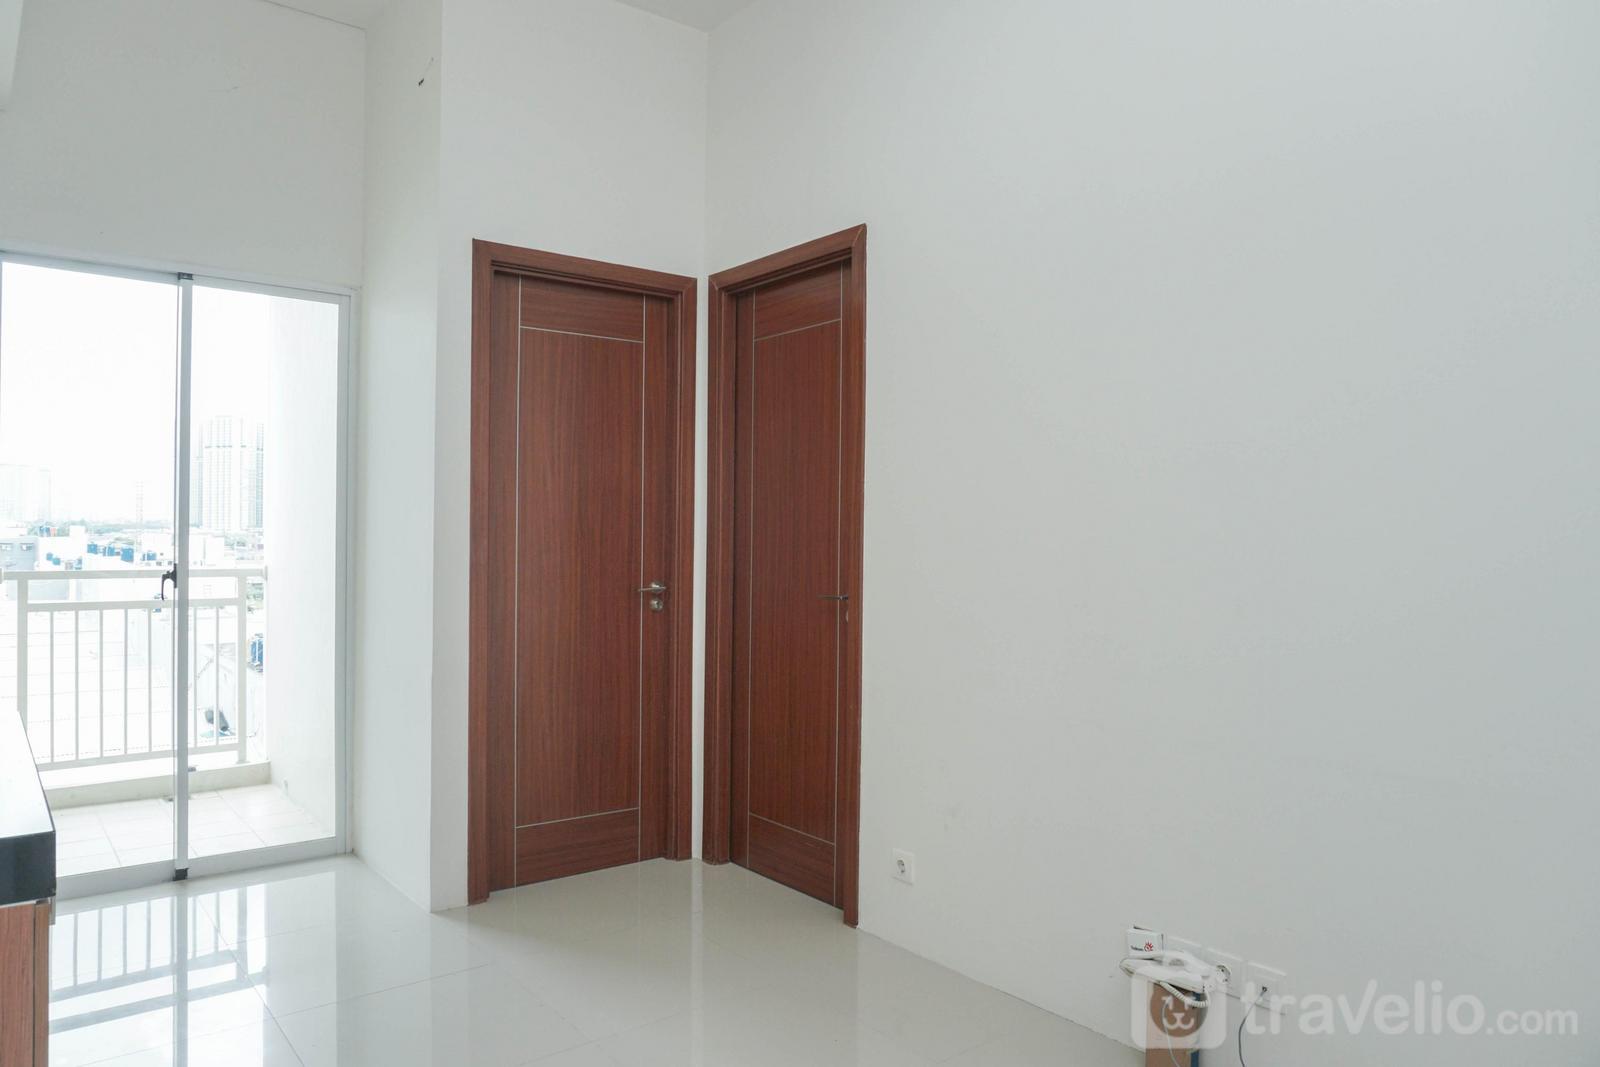 Apartemen Vittoria Residence - 2BR Unfurnished Apartment Vittoria Residence with AC & Kitchen Set By Travelio